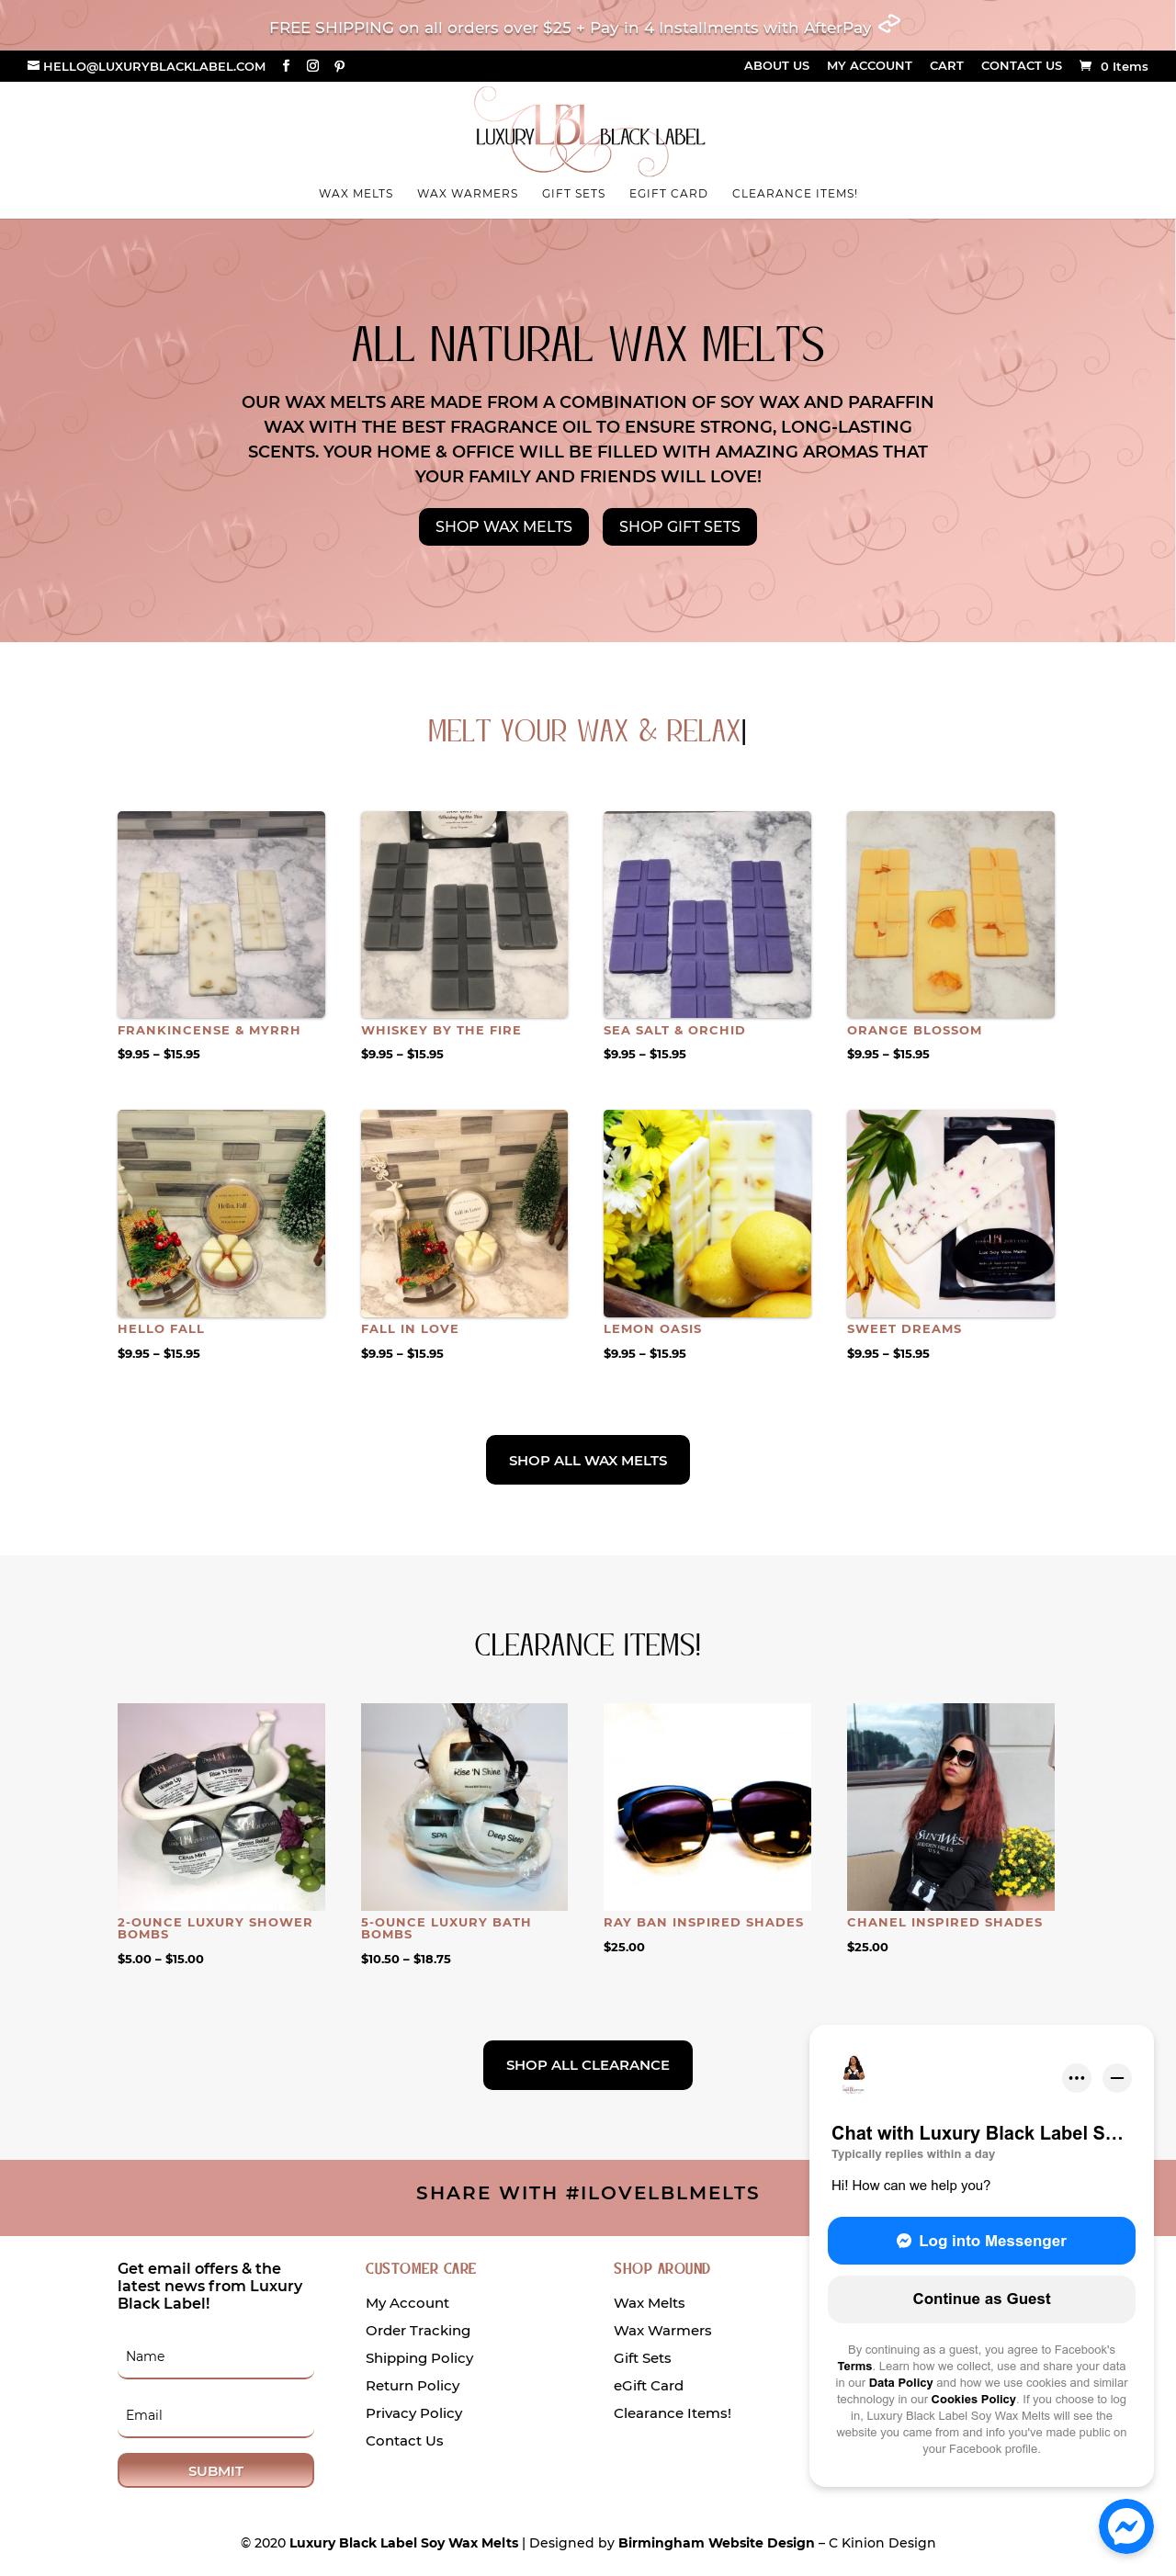 Birmingham-Web-Design-Agency-C-Kinion-Design - Luxury Black Label - full page